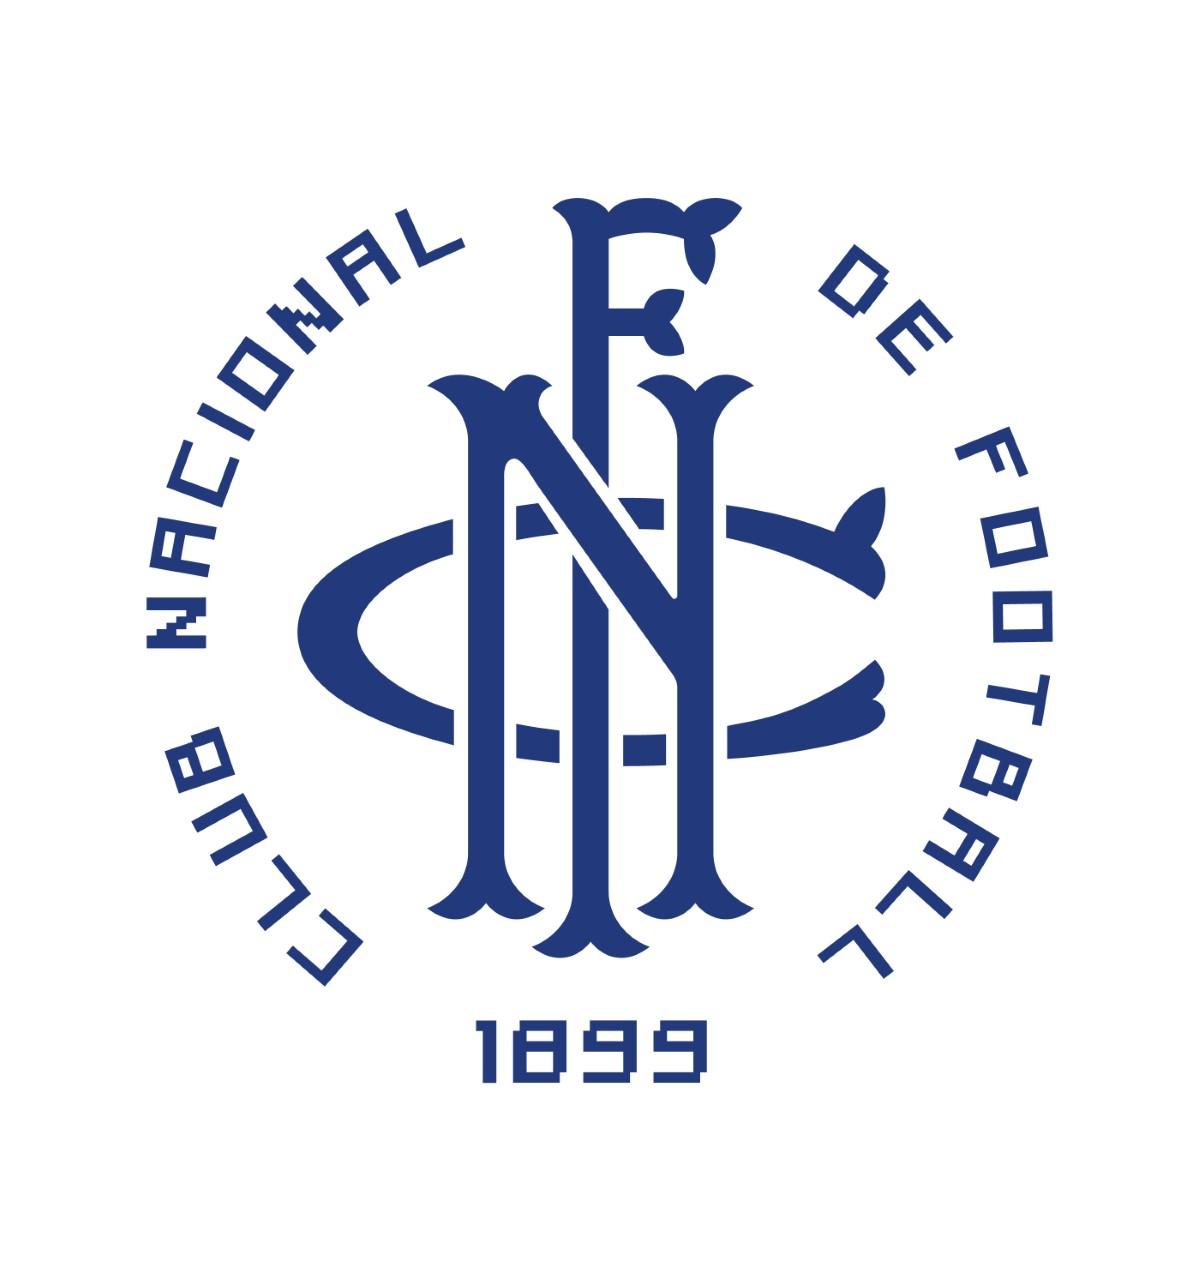 Nacional crest